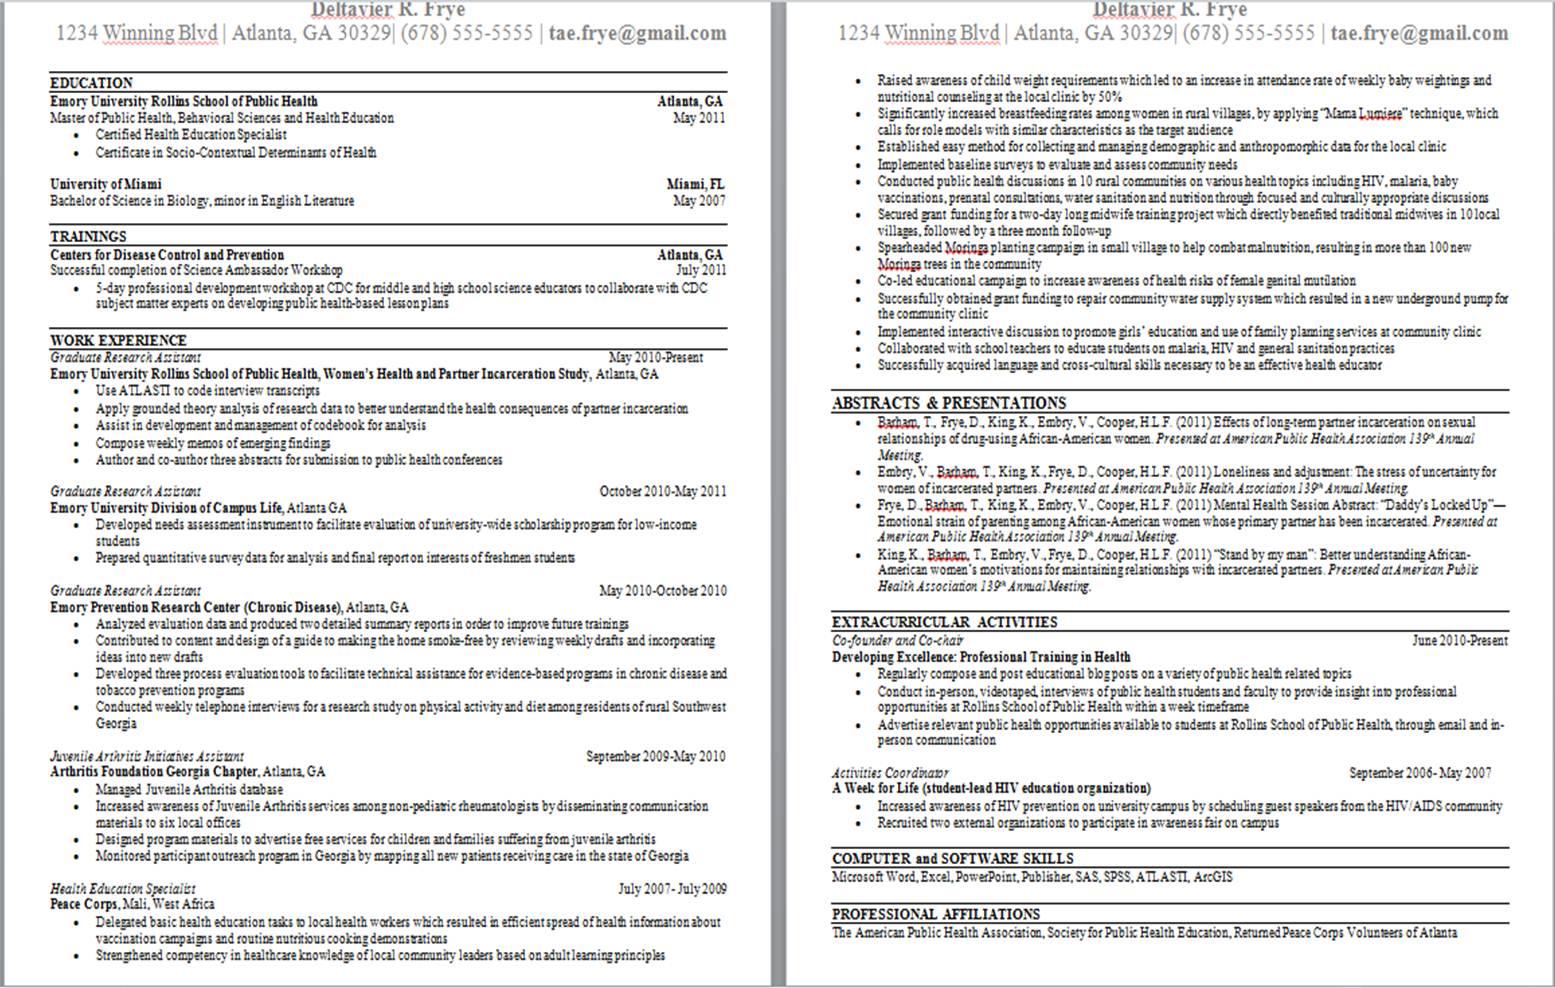 Submit resume twice